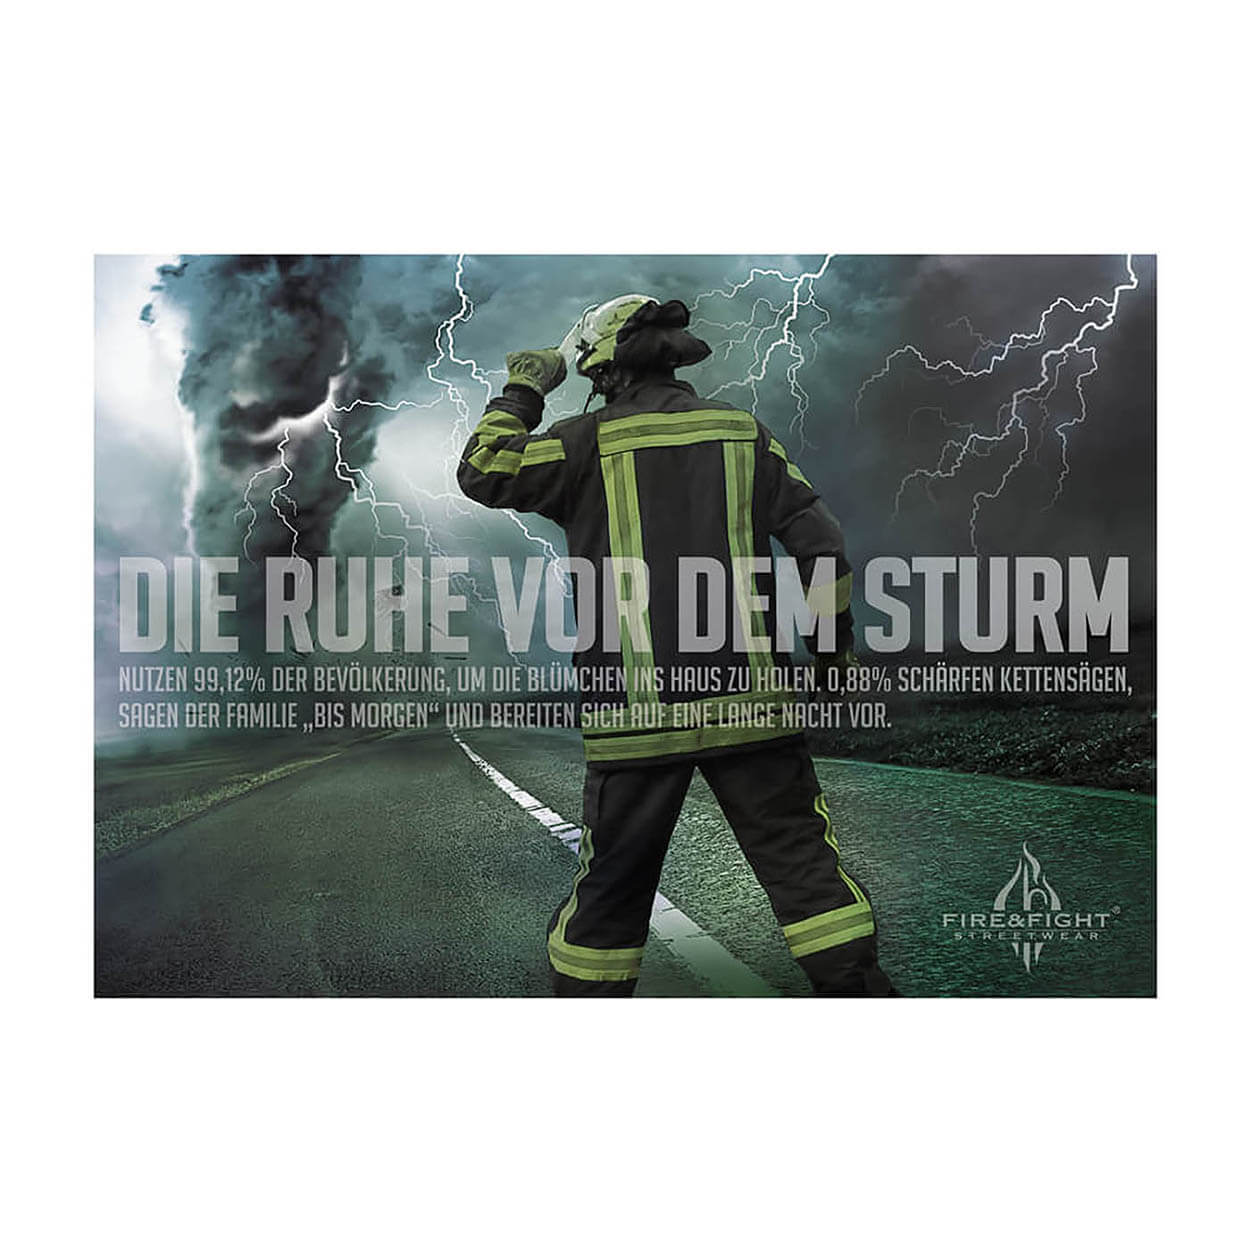 Feuerwehrposter Ruhe vor dem Sturm